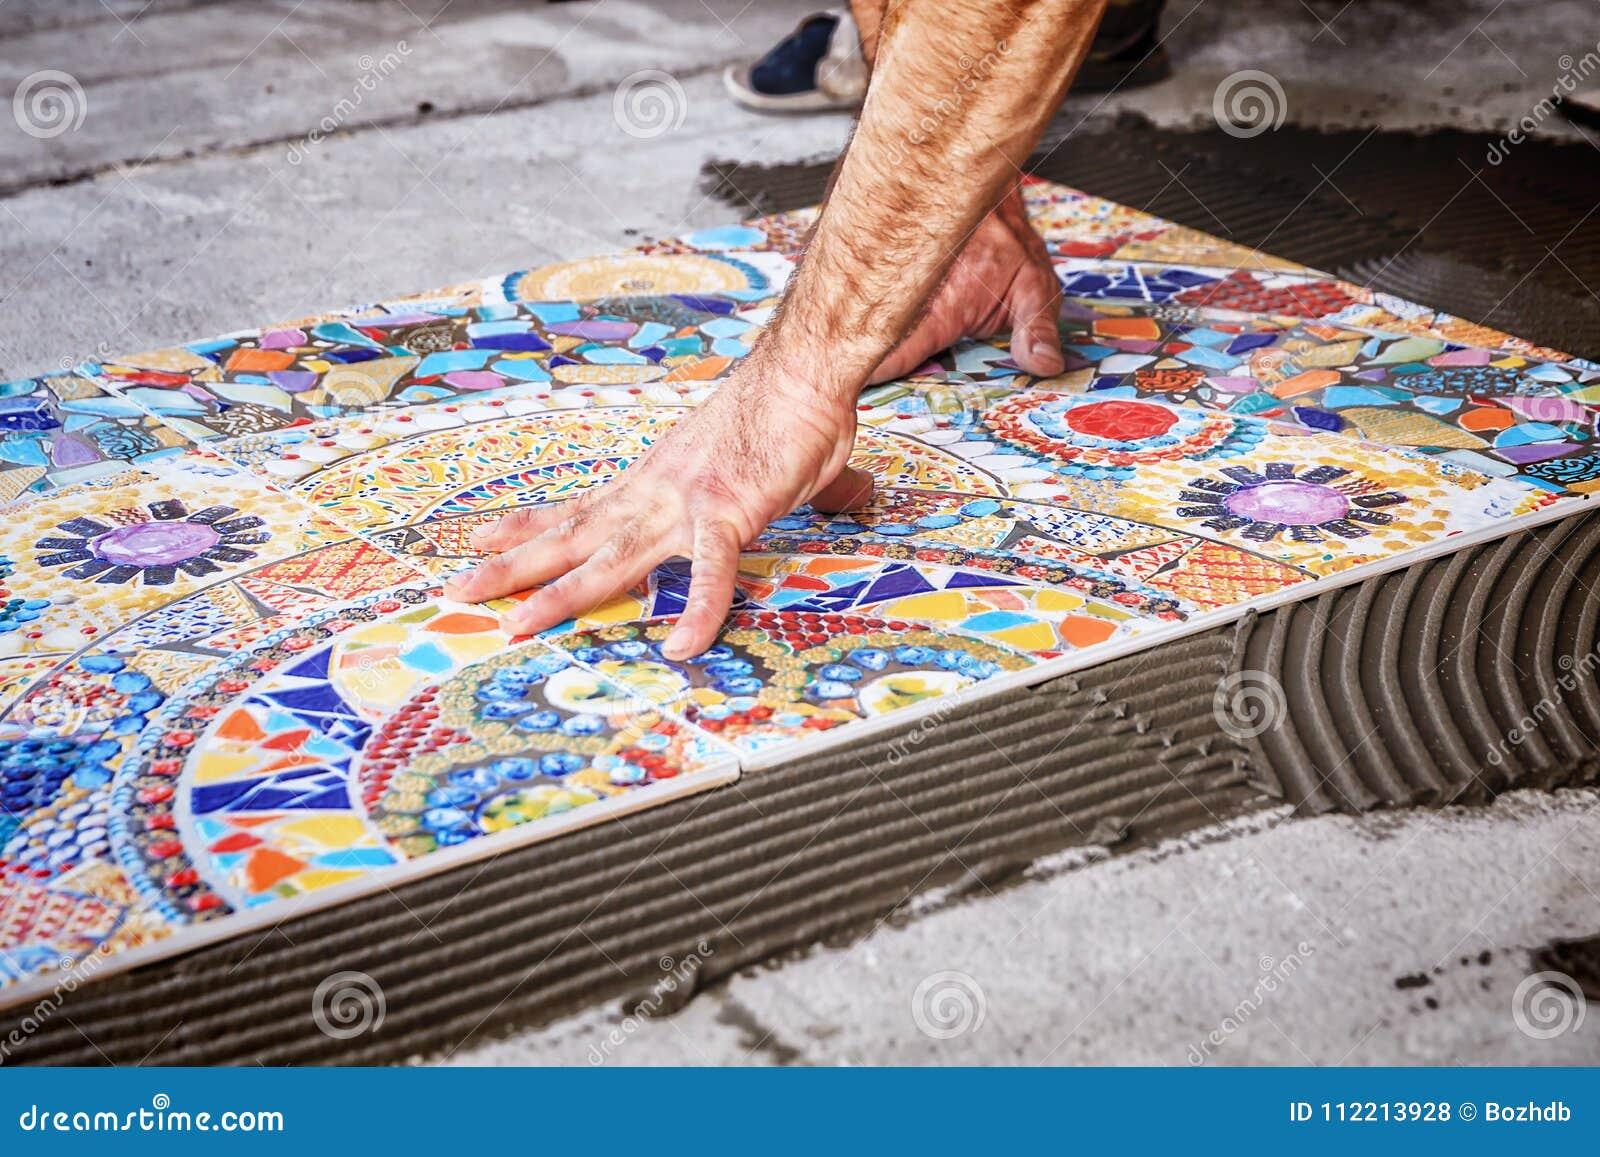 Laying Floor Ceramic Tile Stock Photo Image Of Mortar 112213928